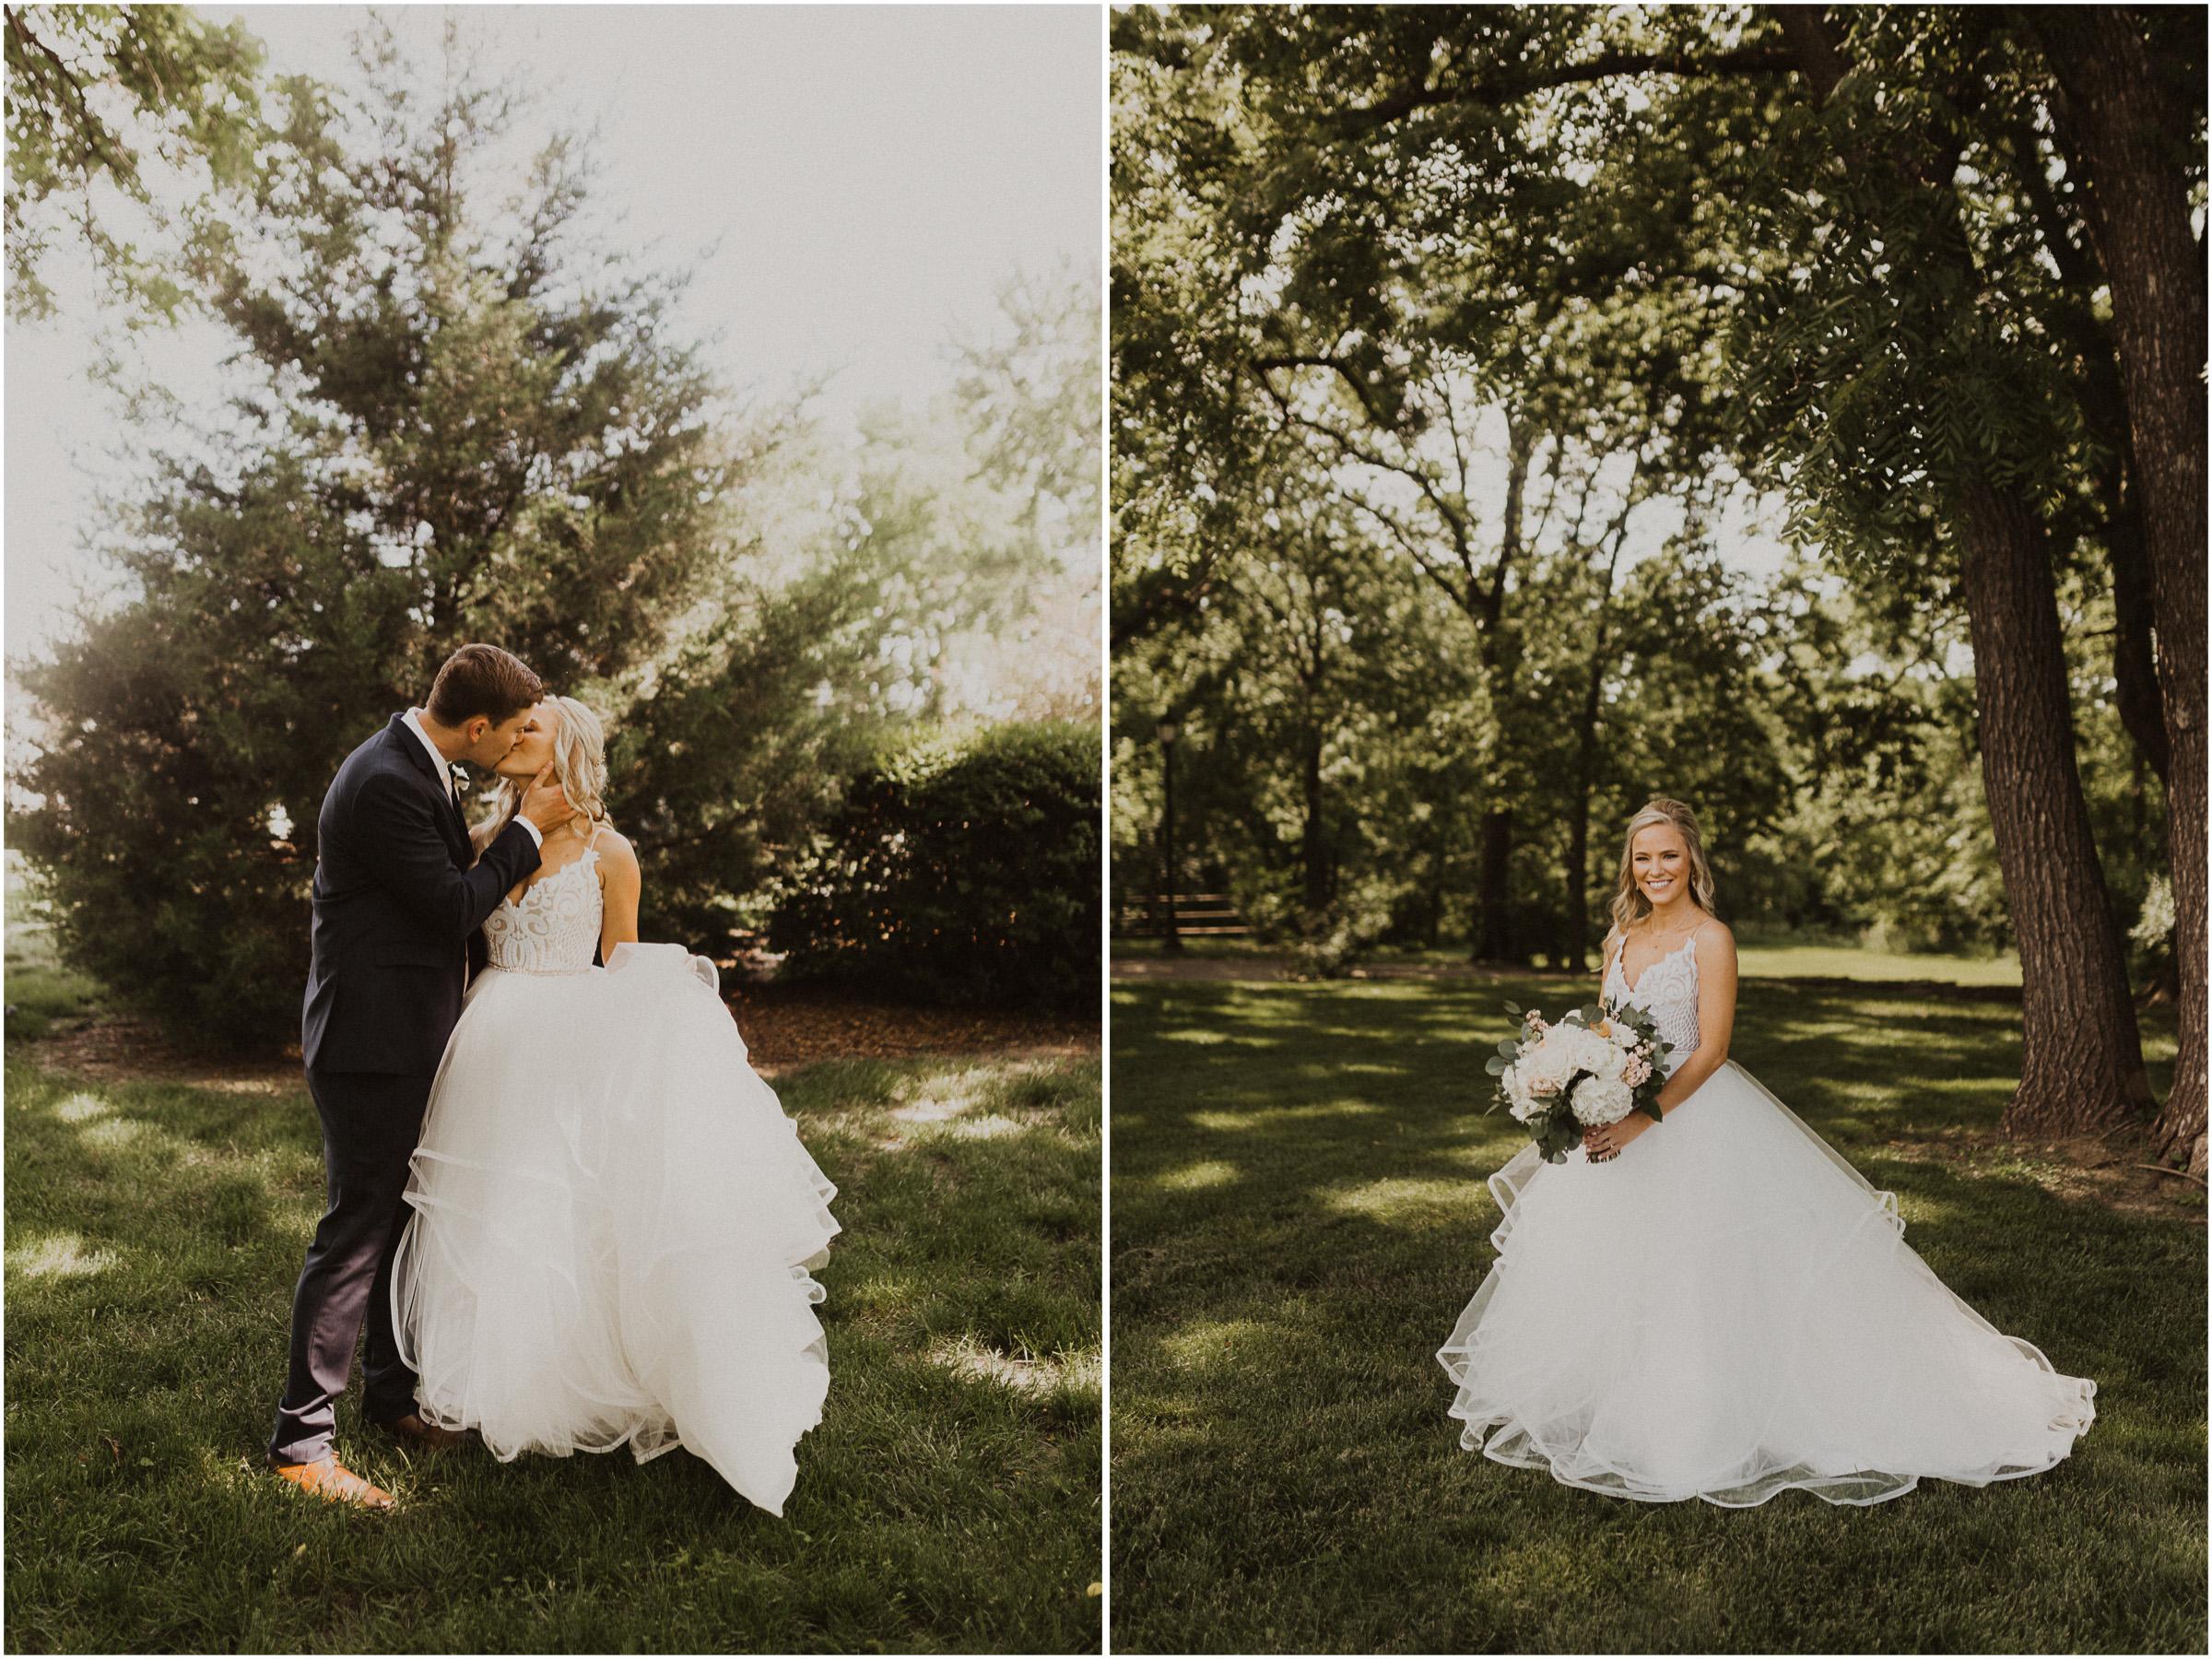 alyssa barletter photography hawthorne house summer outdoor wedding southern charm inspiration-33.jpg